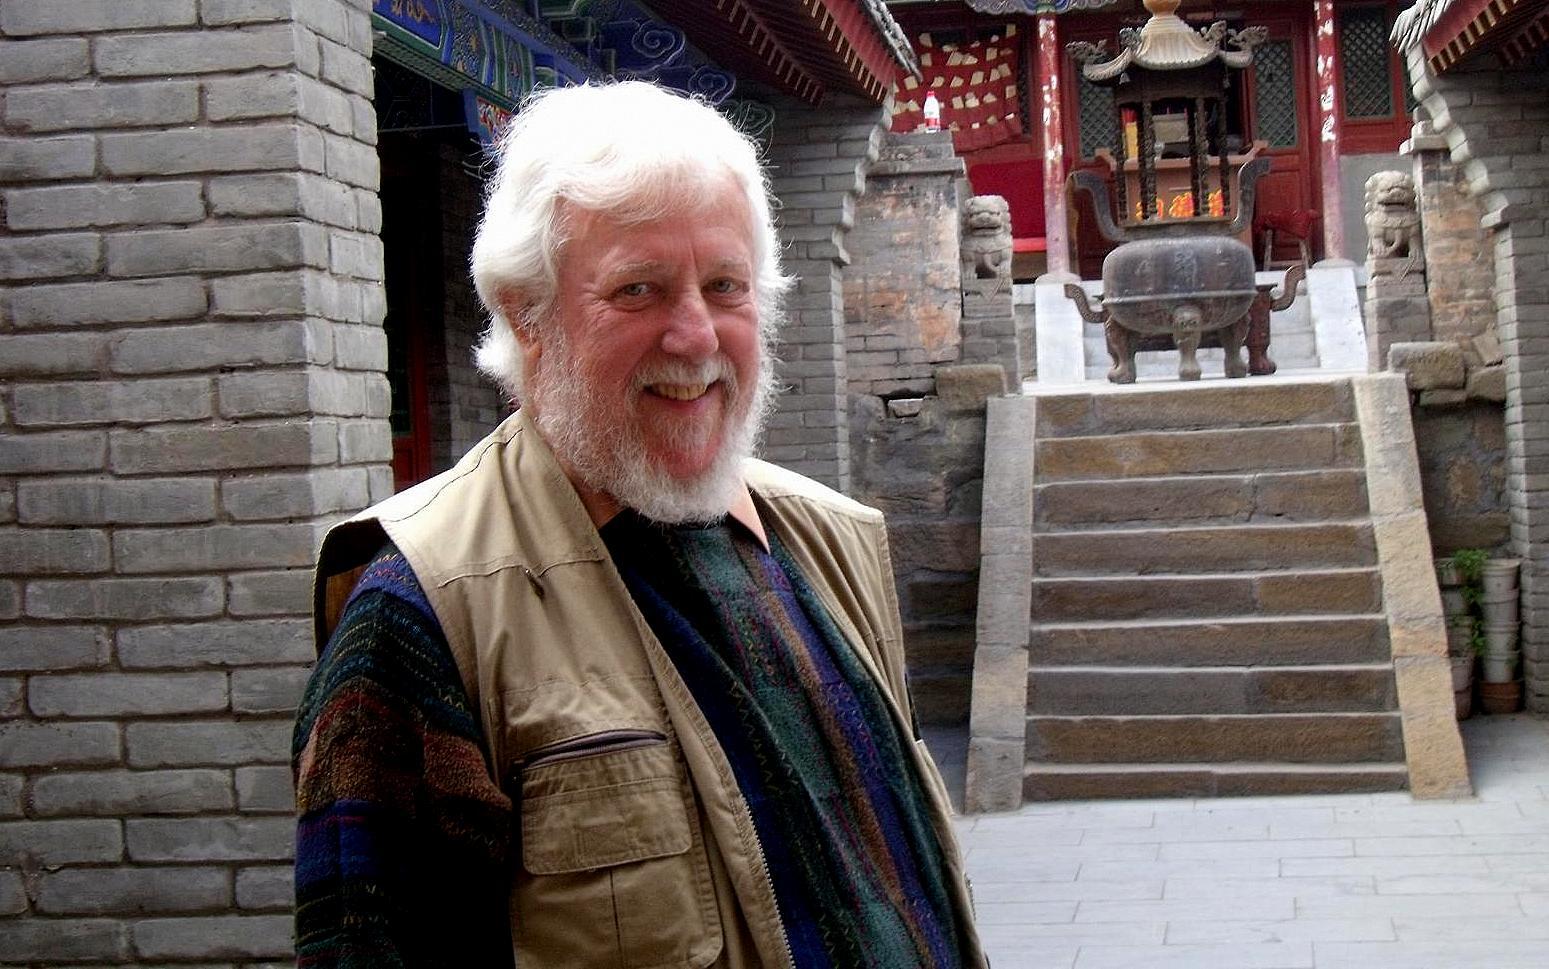 Tourism Professor Geoffrey Wall